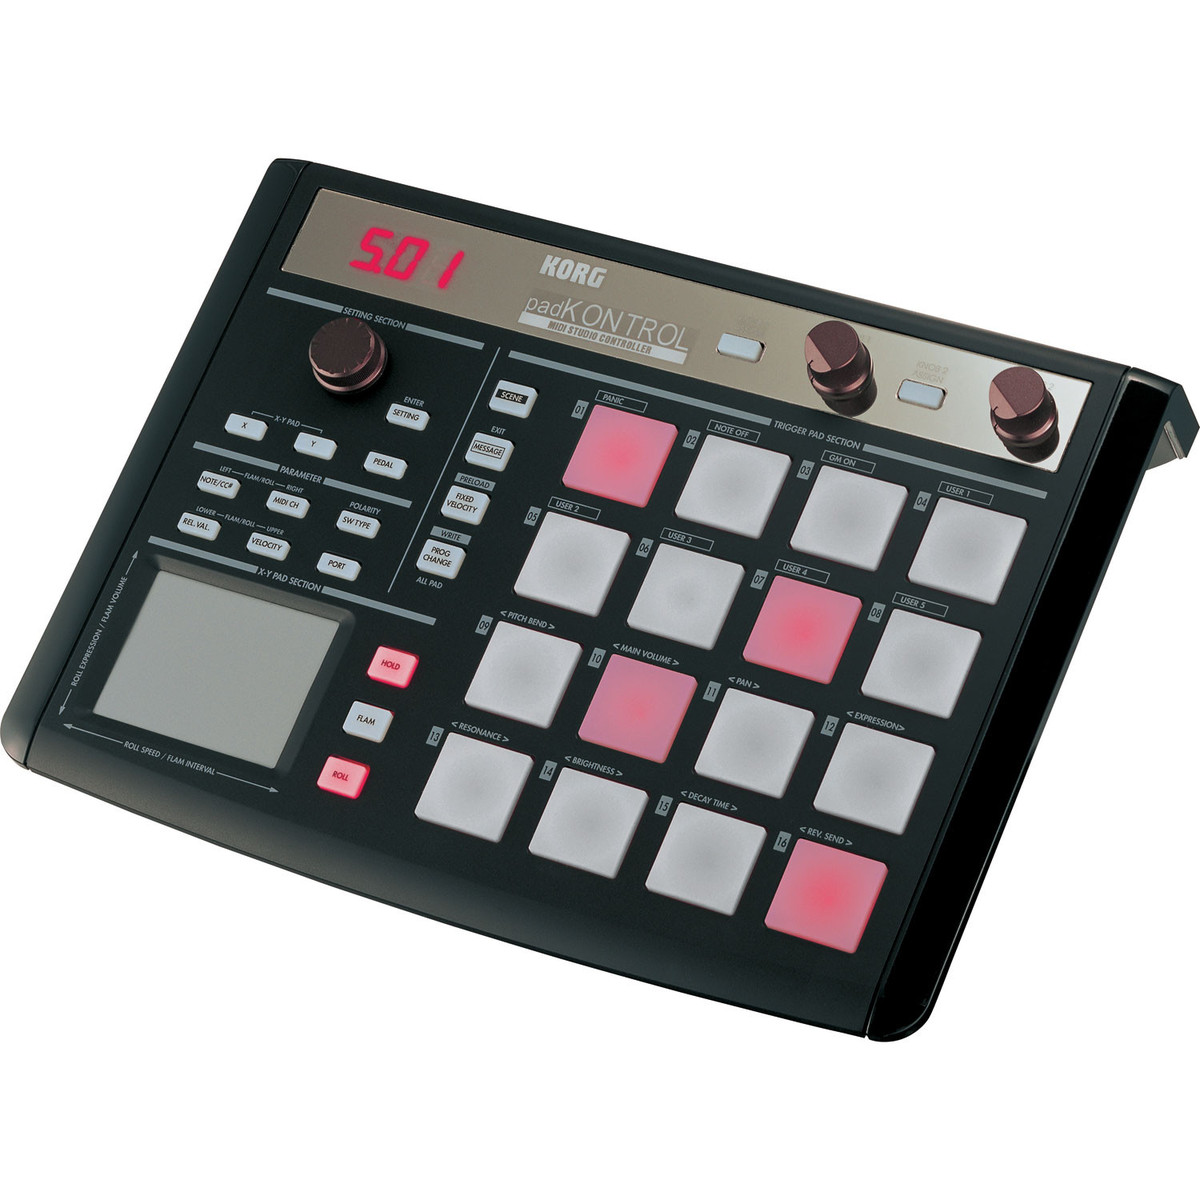 Korg Padkontrol Midi Pad Controller Limited Edition Black